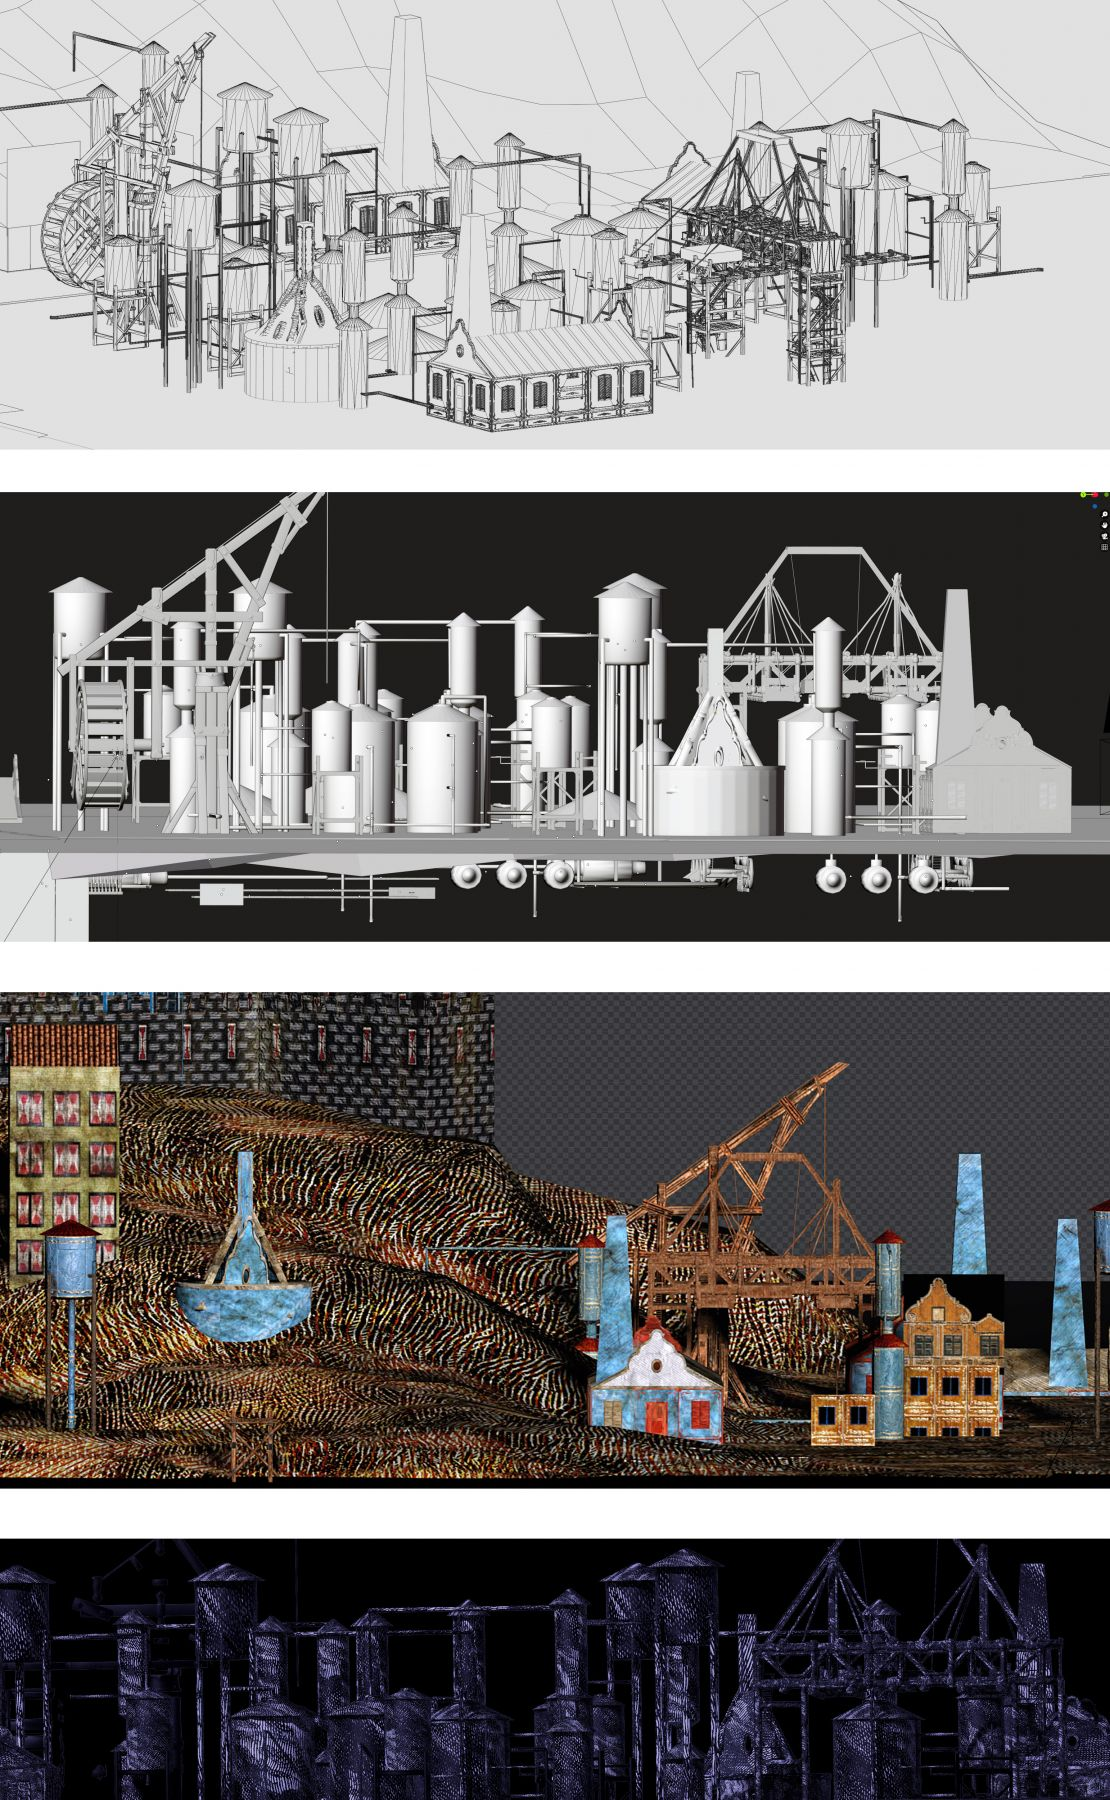 Refinery model steps